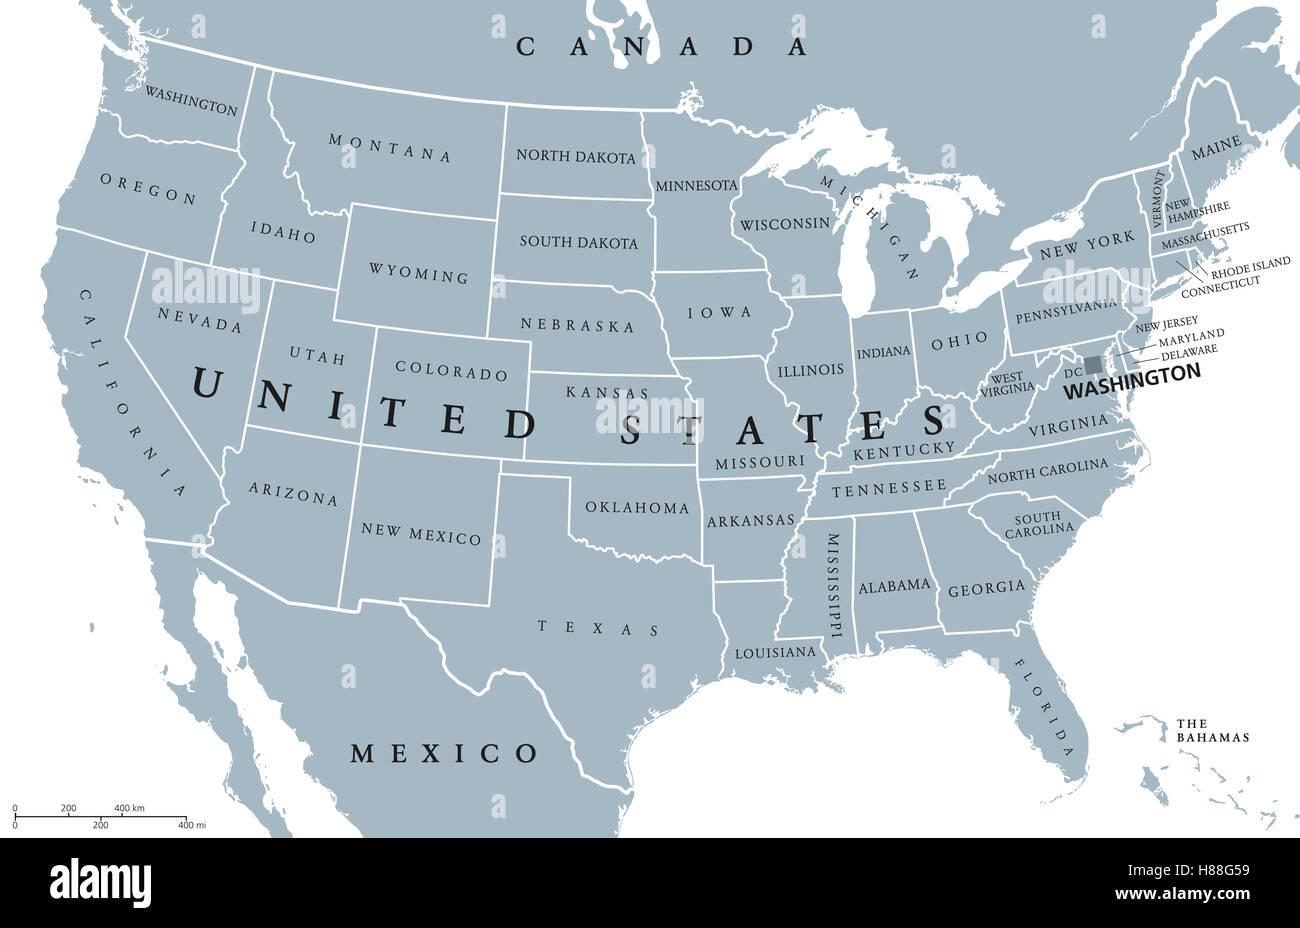 Usa Cartina Politica Con Capitali.Stati Uniti Stati Uniti D America Mappa Politico Con Capitale Washington Singoli Stati Paesi Confinanti Eccetto Hawaii E Alaska Foto Stock Alamy